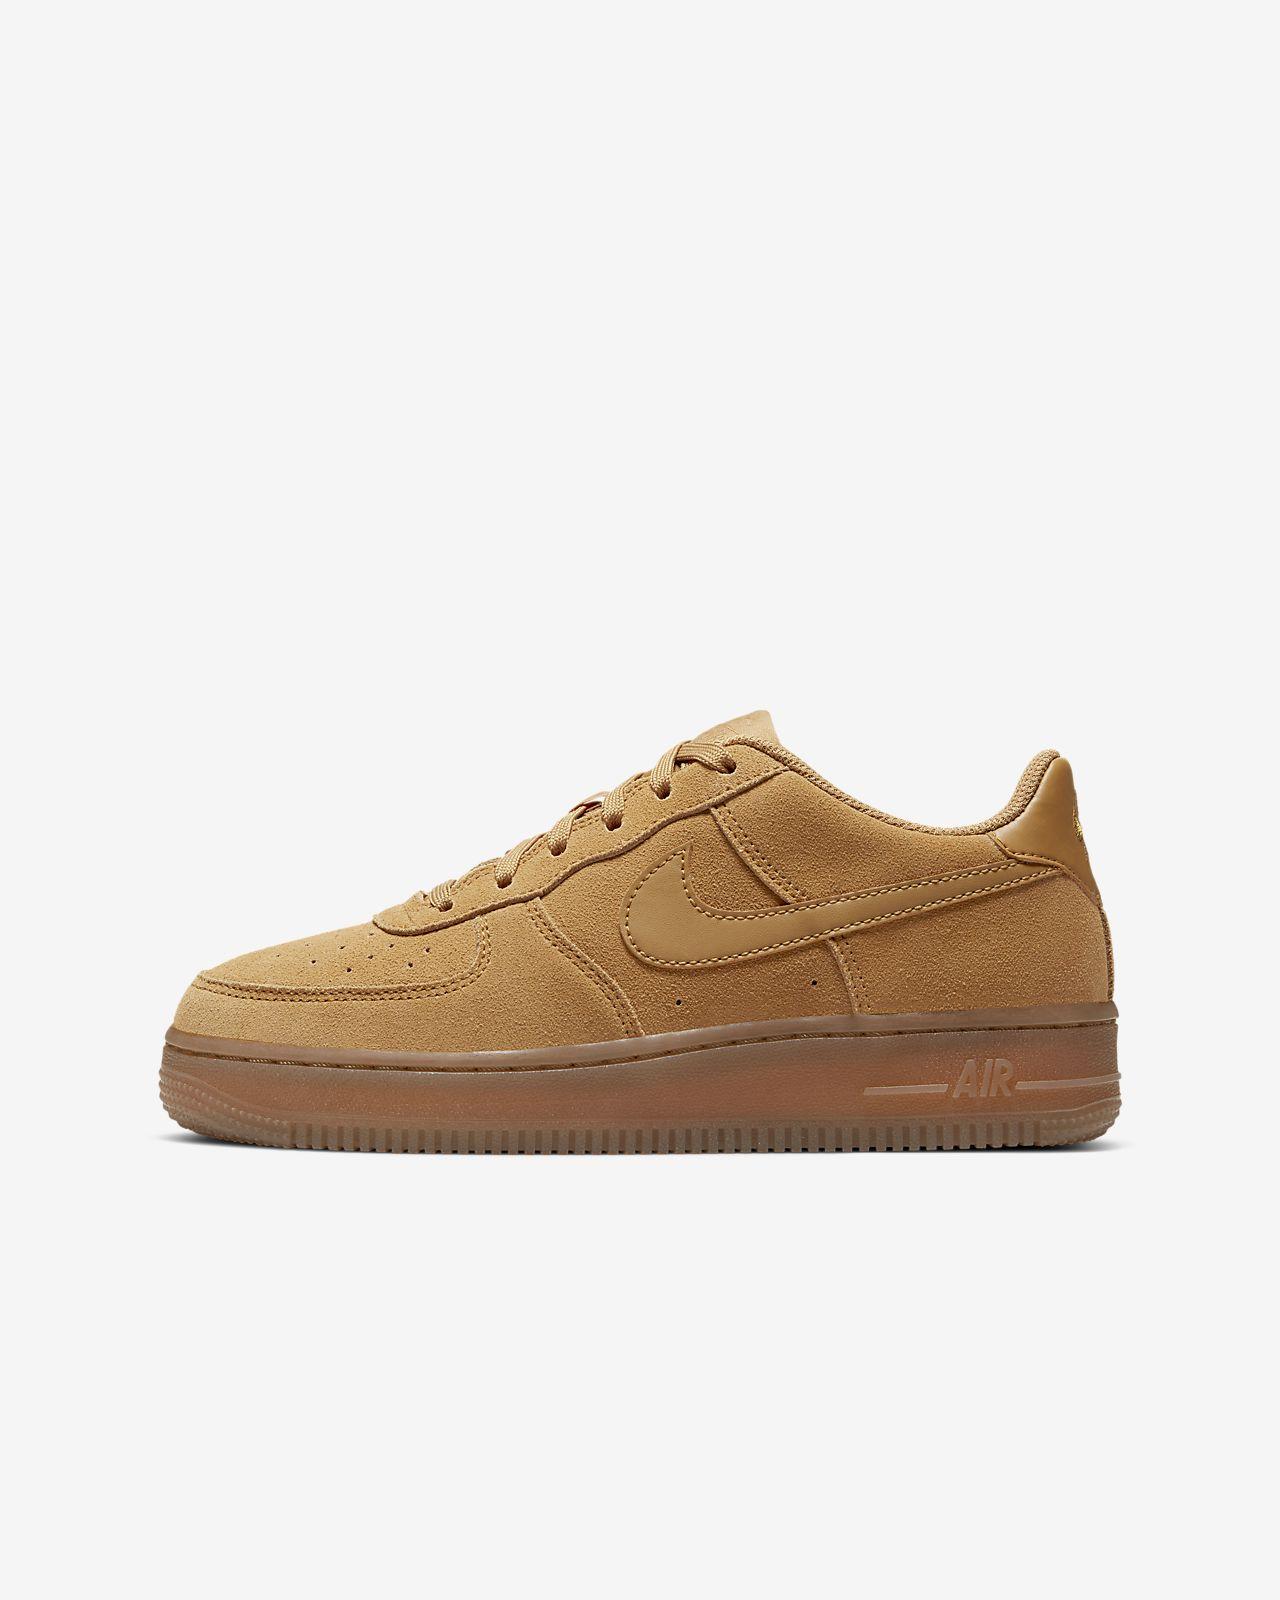 Nike Air Force 1 LV8 3 (GS) 大童运动童鞋